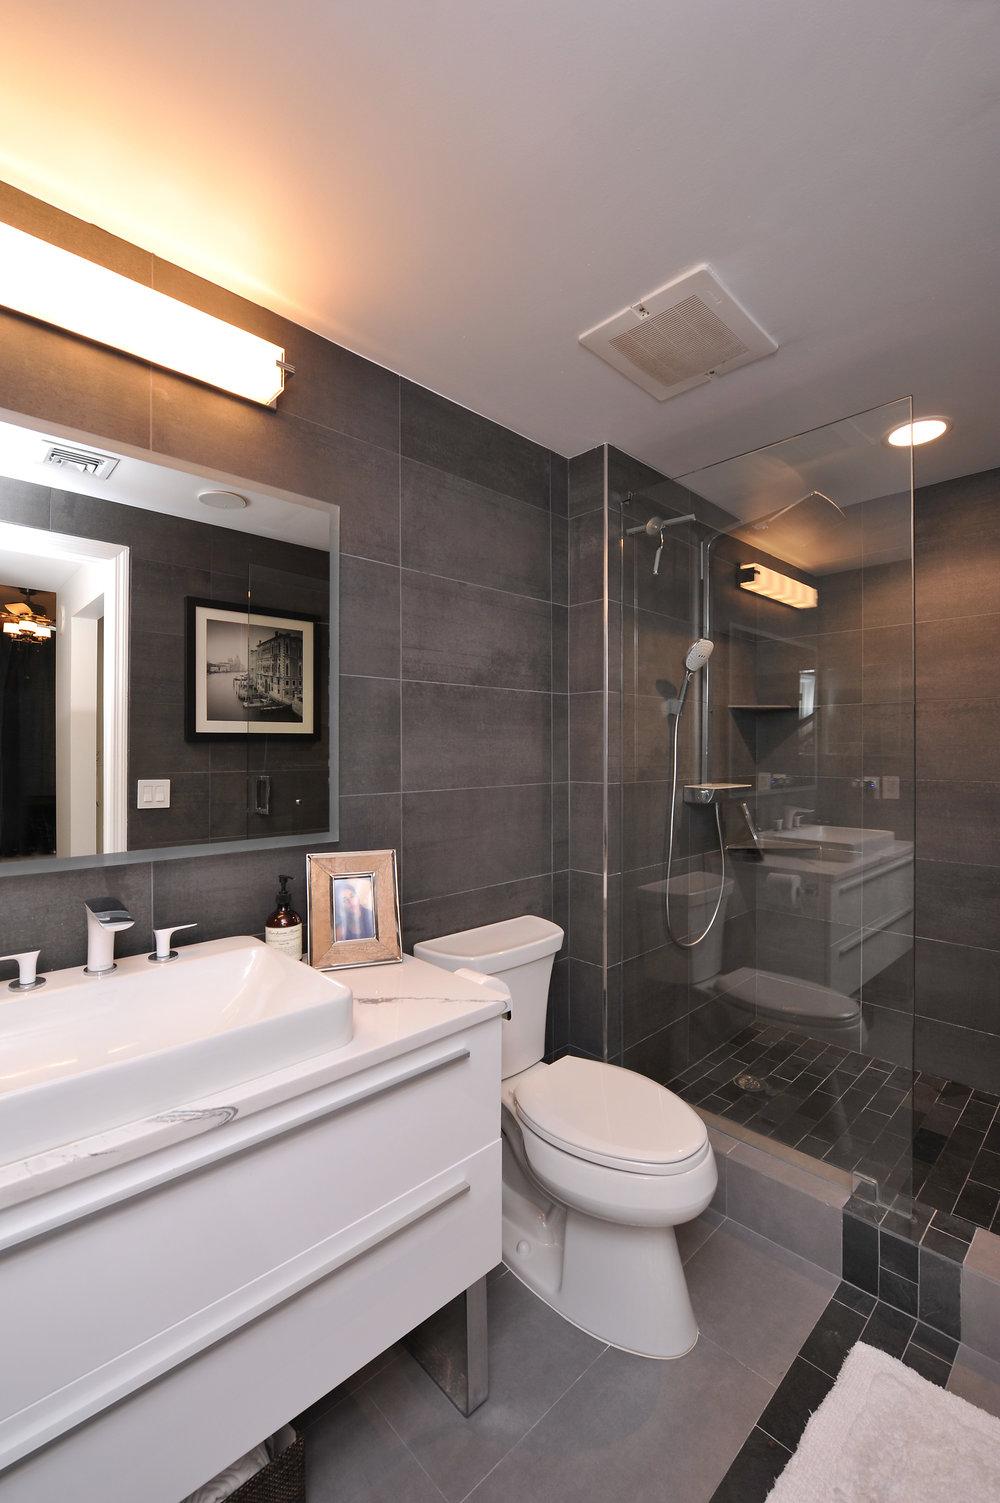 sheffield_construction_broward_gallery_bathroom6.jpg